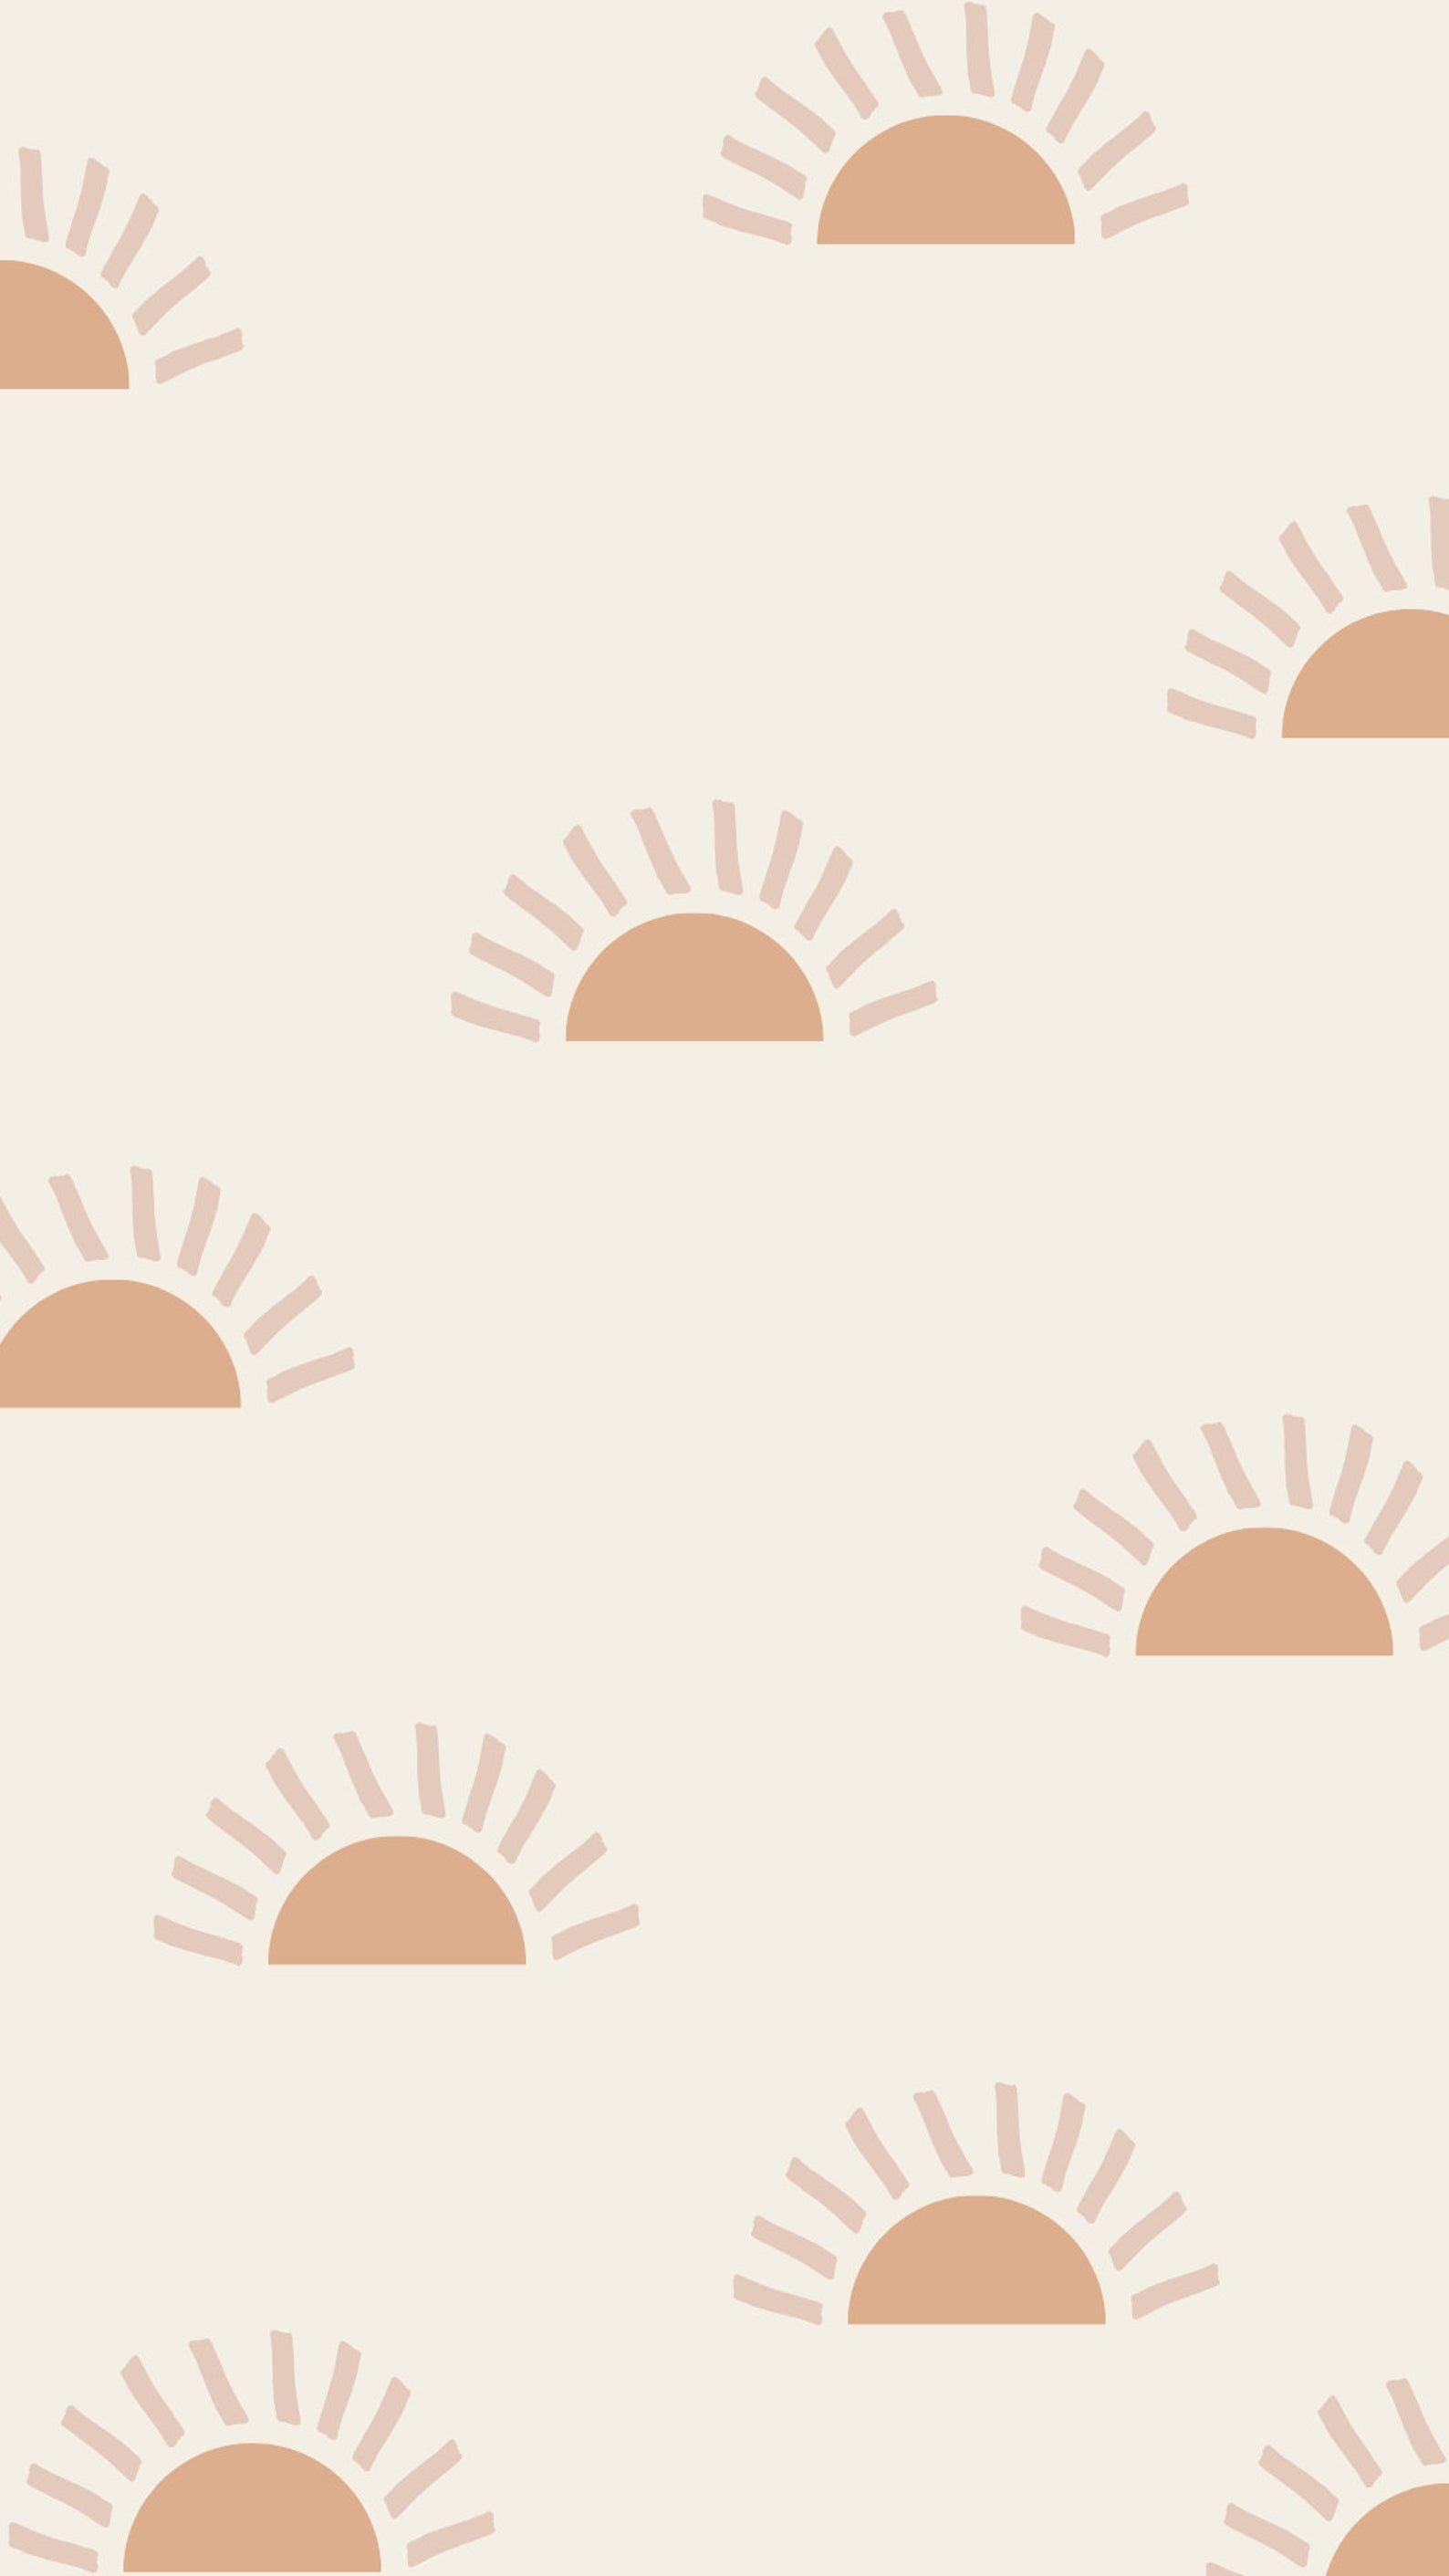 20 Boho Phone Wallpapers, Pink Digital Wallpapers, Digital iPhone Backgrounds, Pastel Positivity Wallpaper Designs